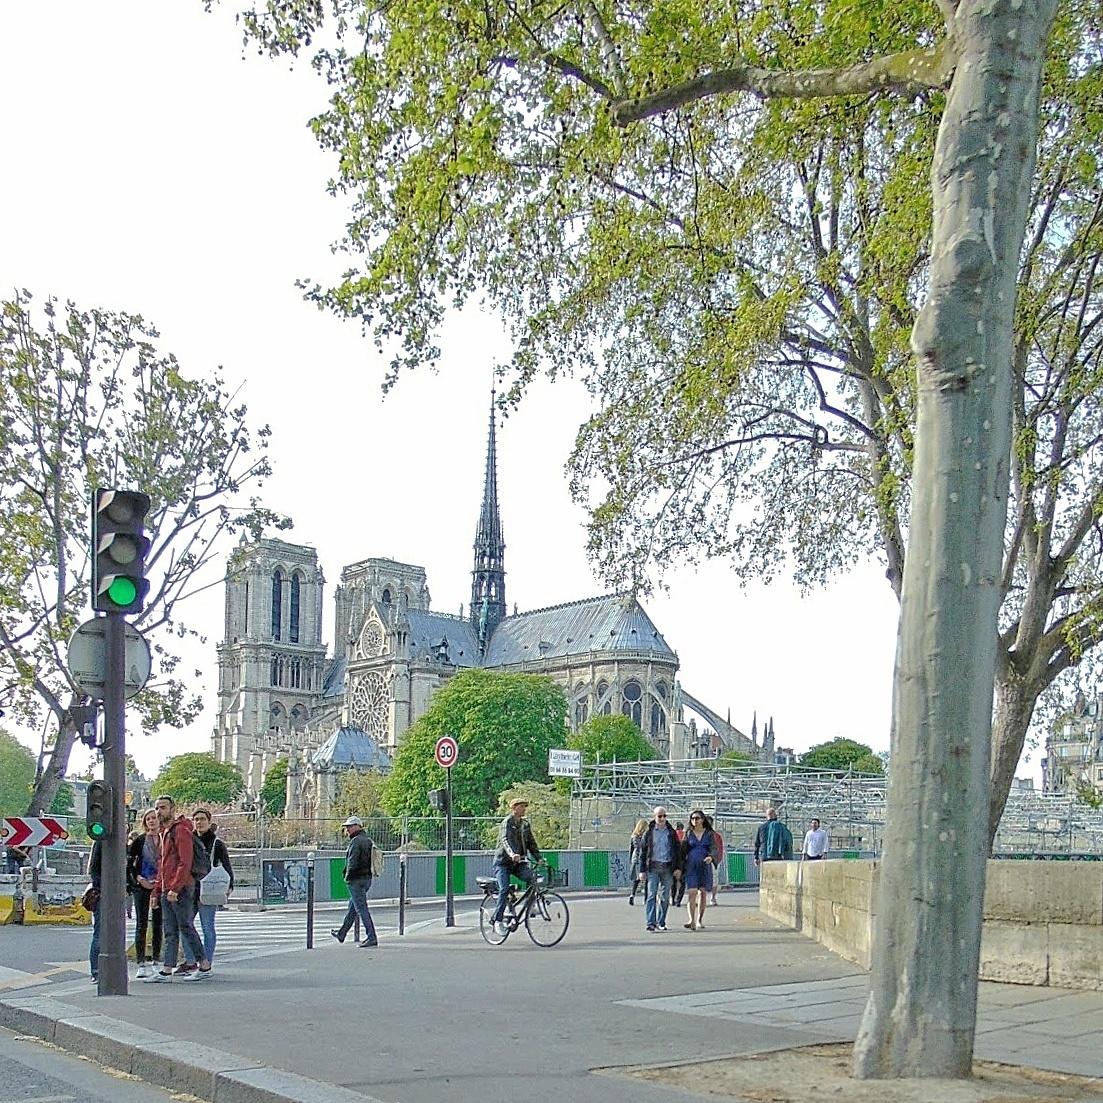 KATEDRA NOTRE DAME PARIS, paryż romantyczne miejsca